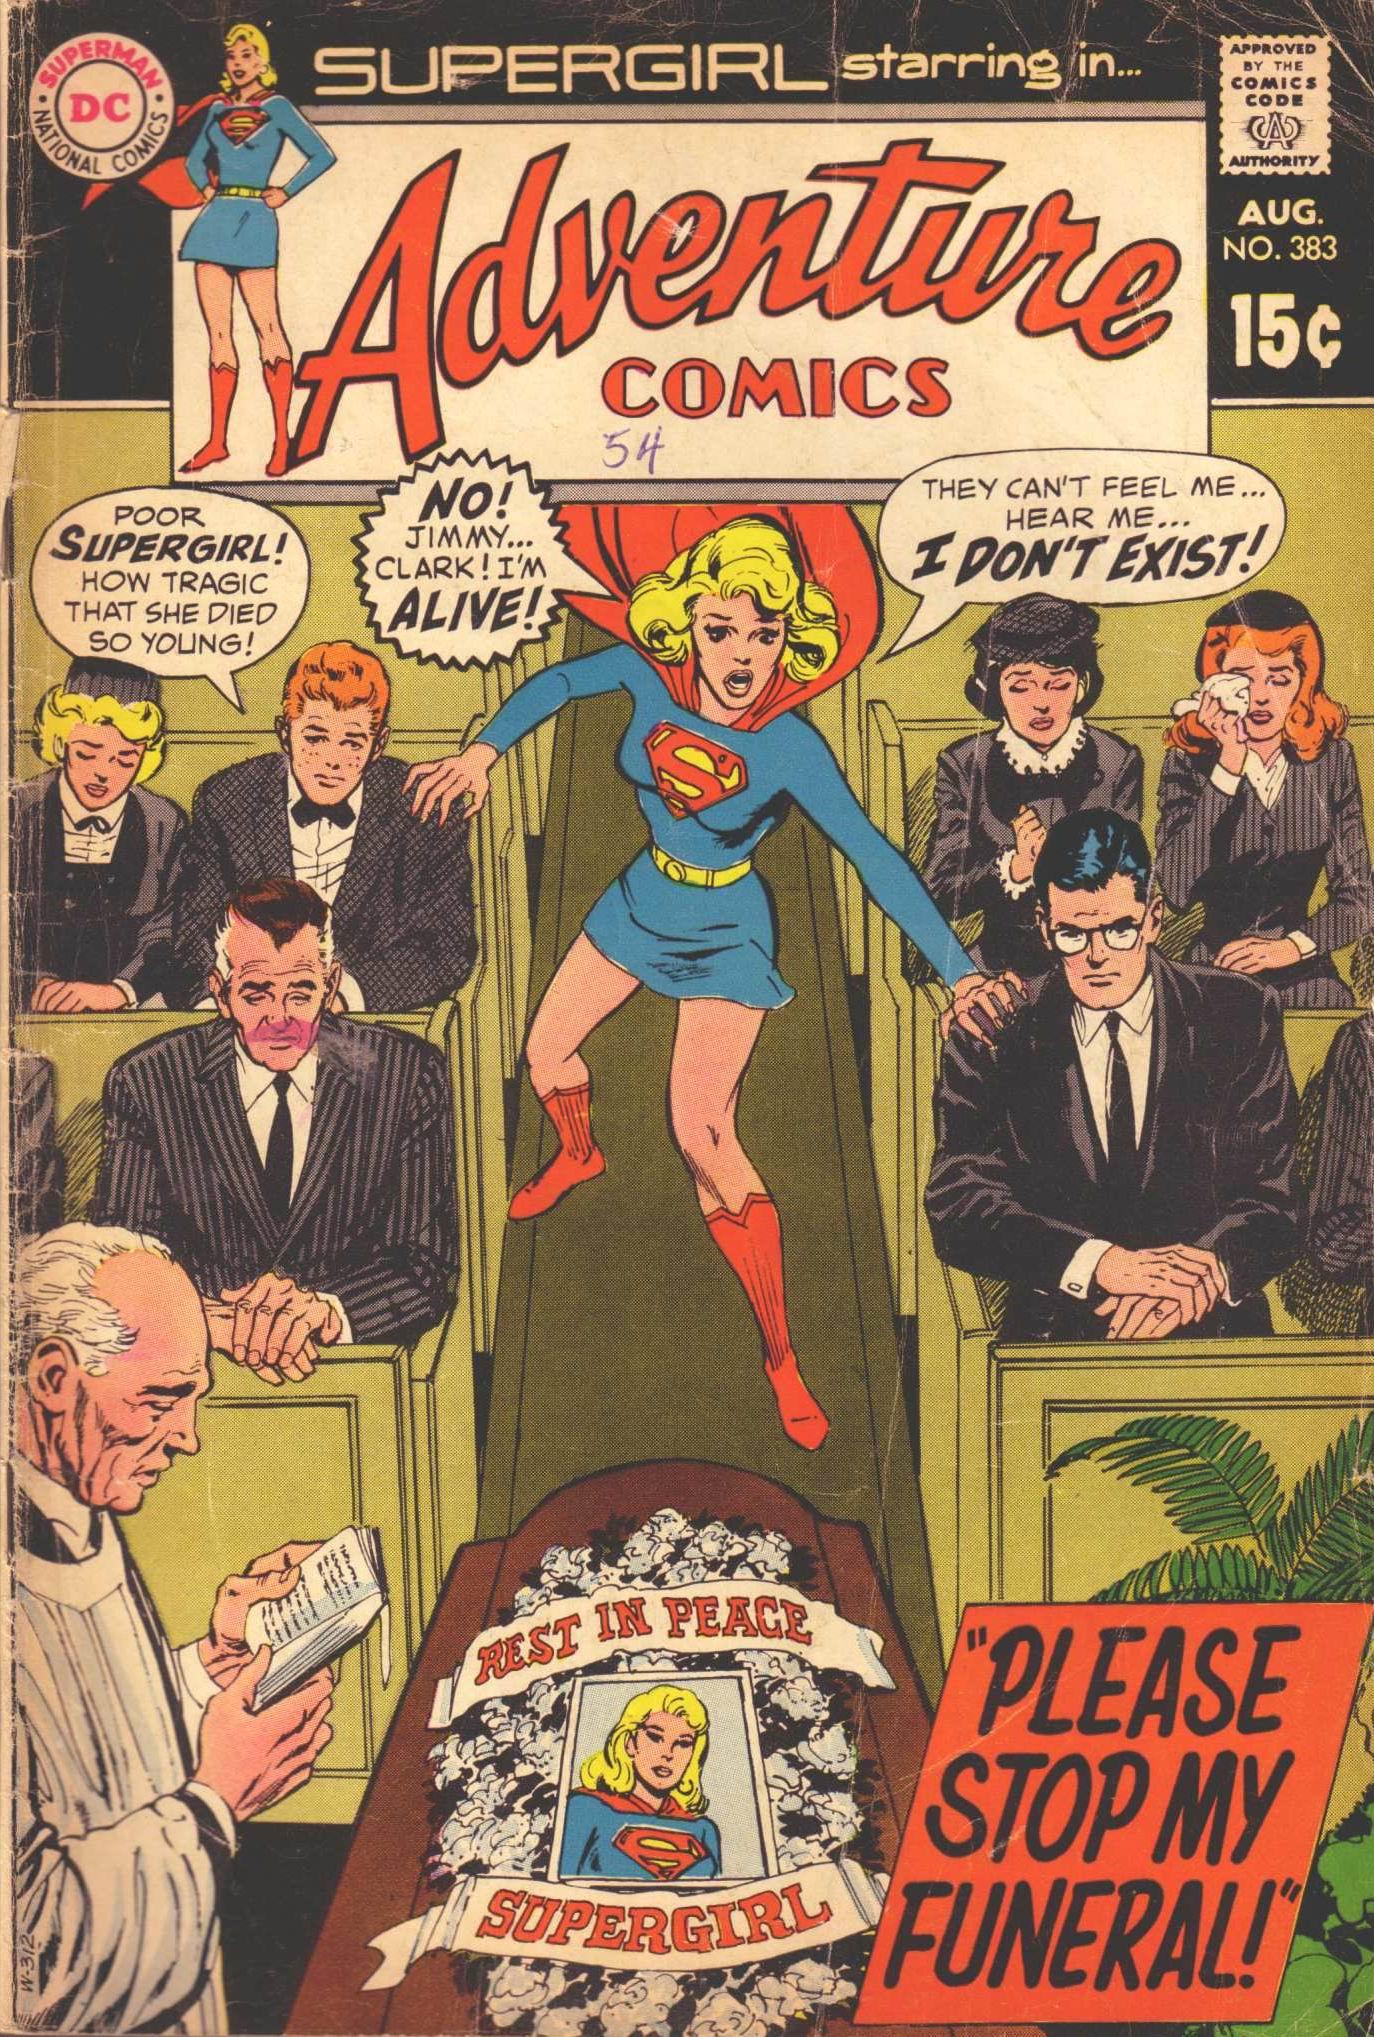 Read online Adventure Comics (1938) comic -  Issue #383 - 1